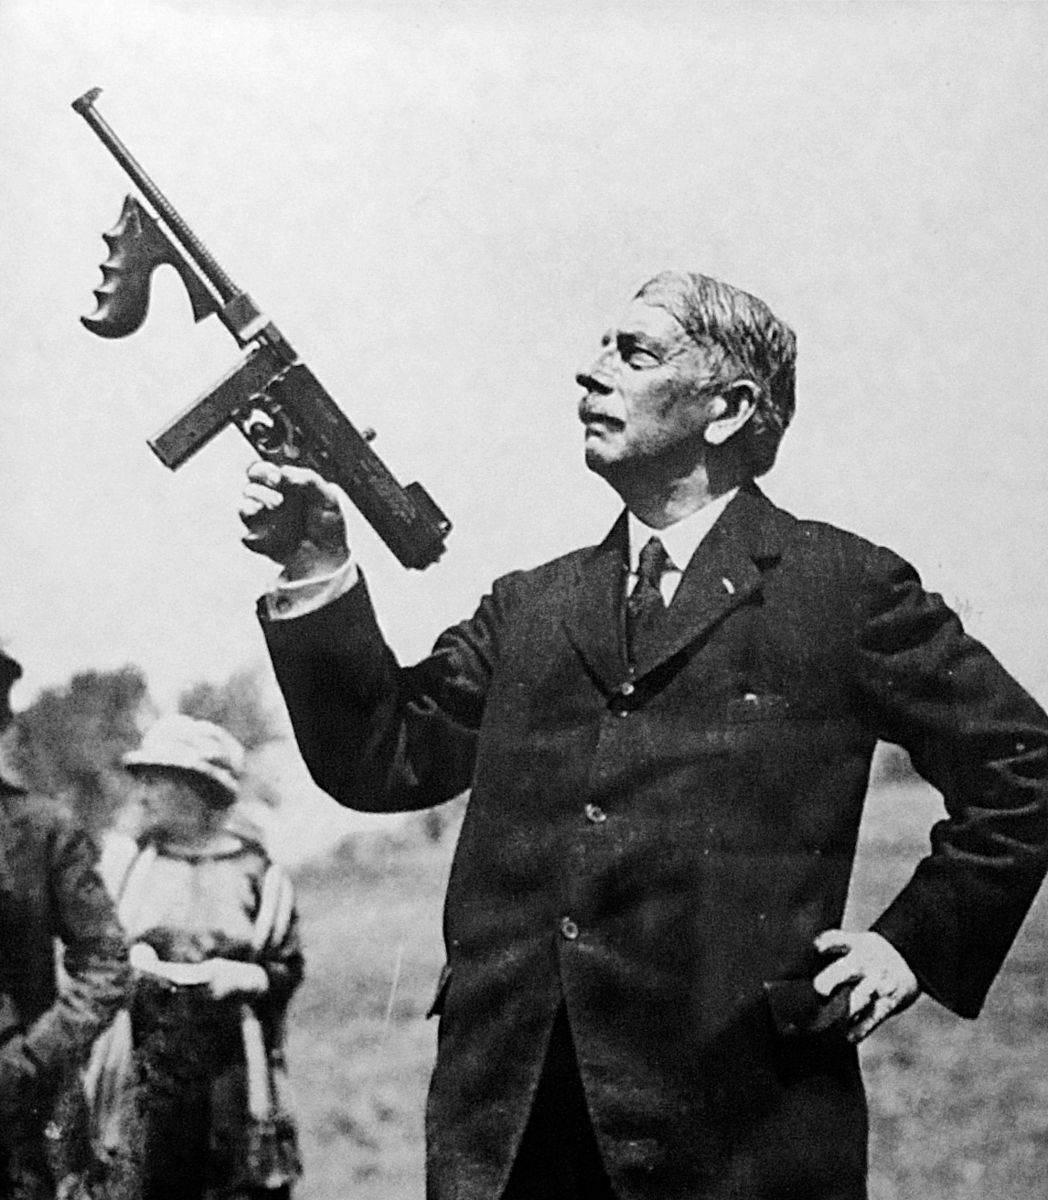 Thompson and his gun - Le General John Taliaferro Thompson et son bébé : La Thompson 1921